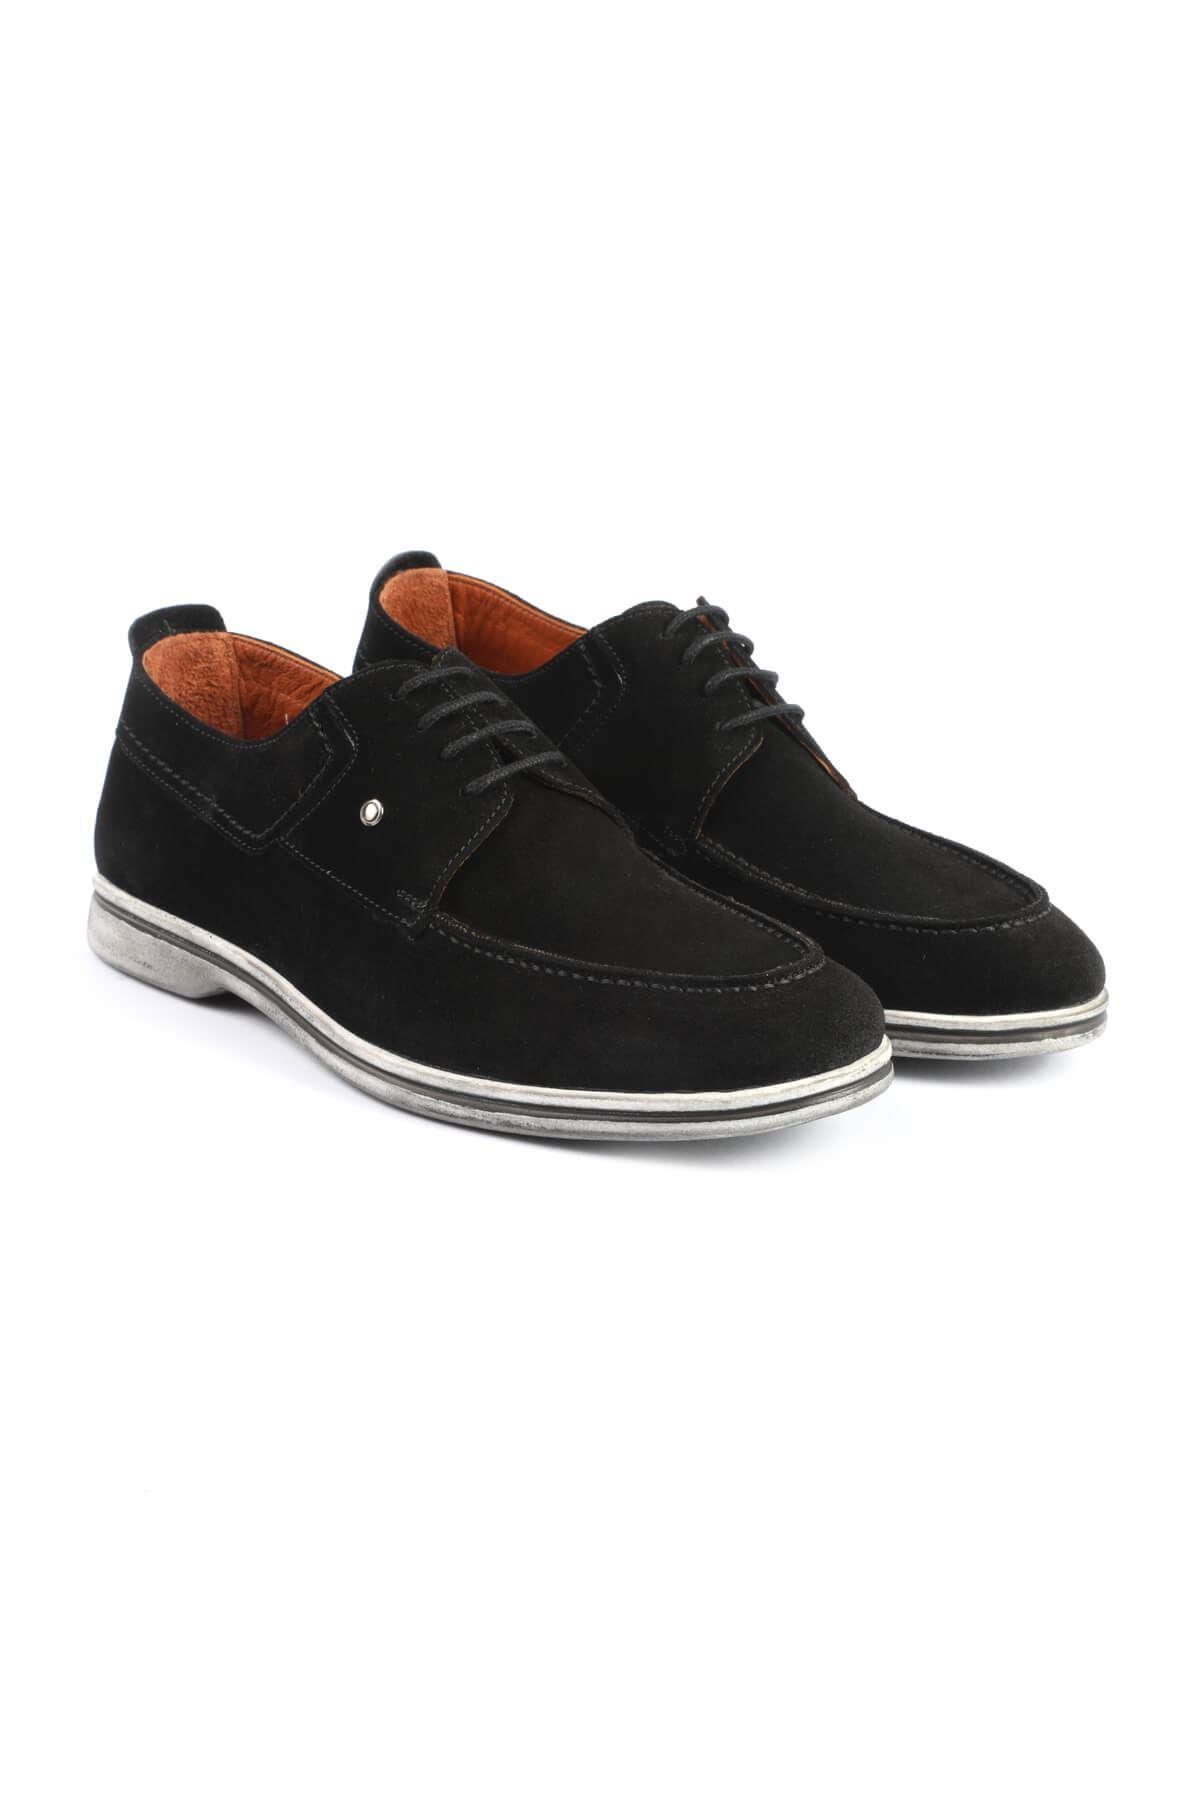 Libero 3005 Black Casual Shoes